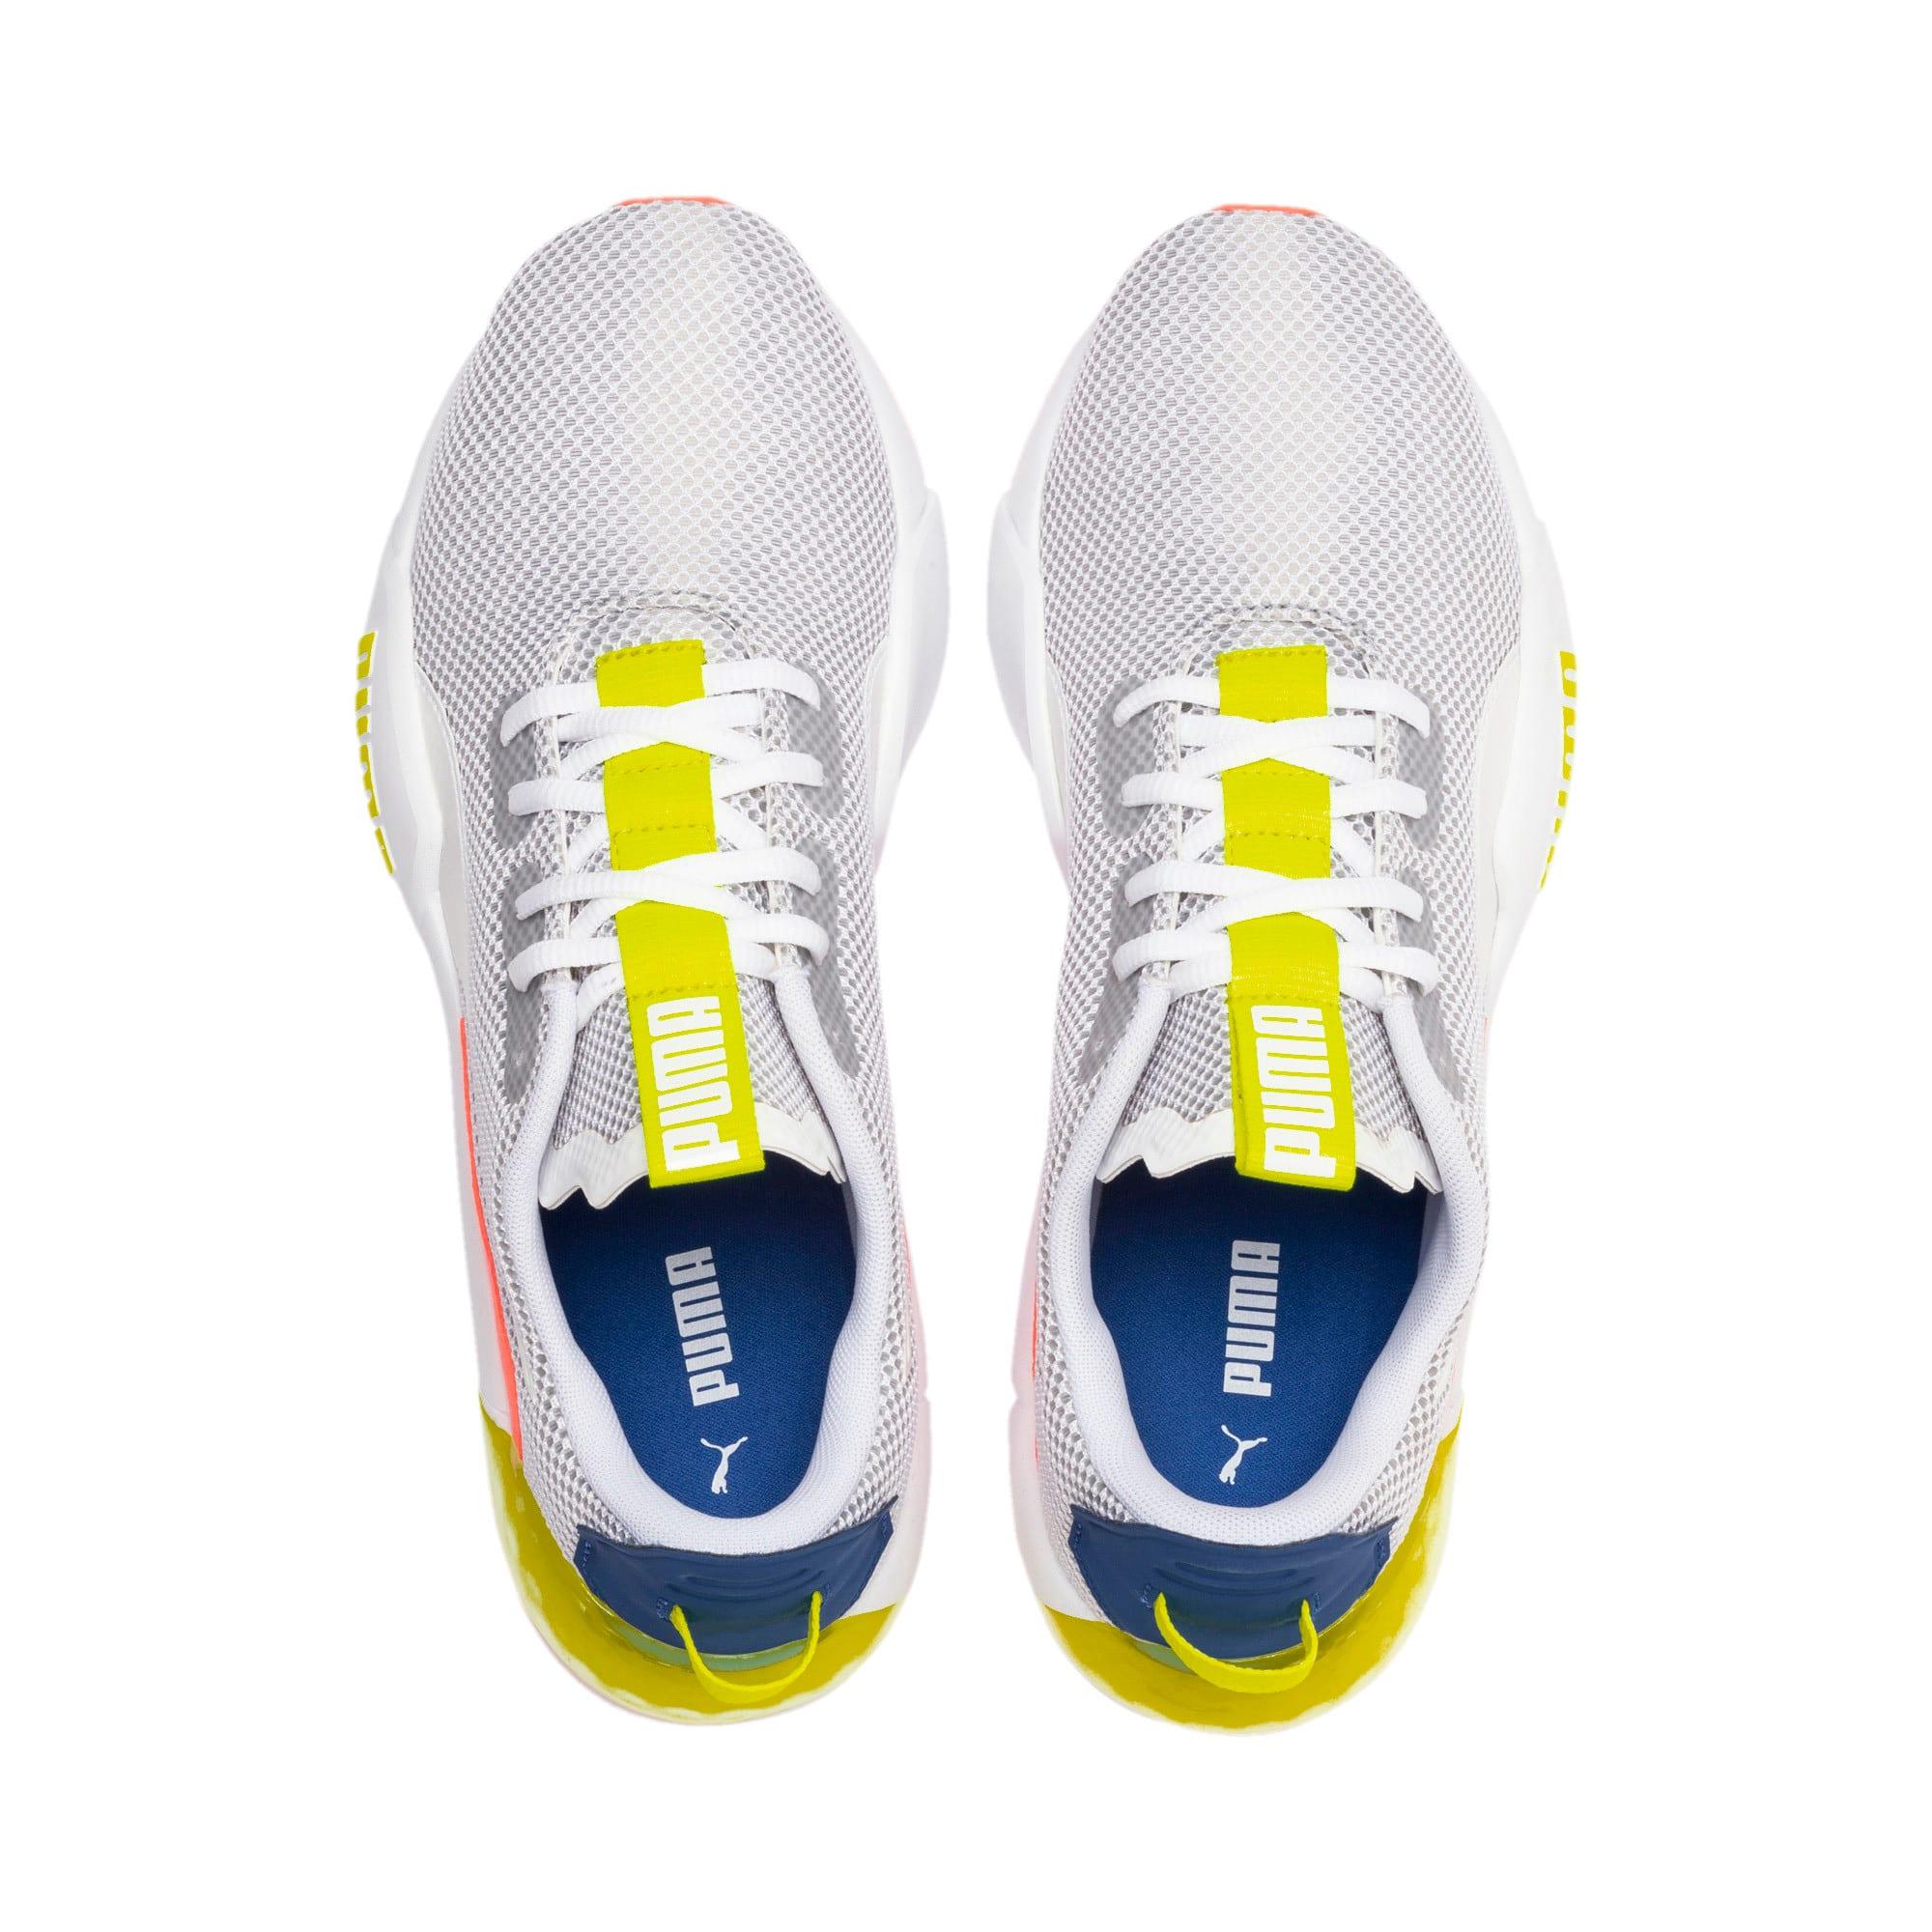 Thumbnail 7 of CELL Phase Men's Training Shoes, White-GalaxyBlue-YellowAlert, medium